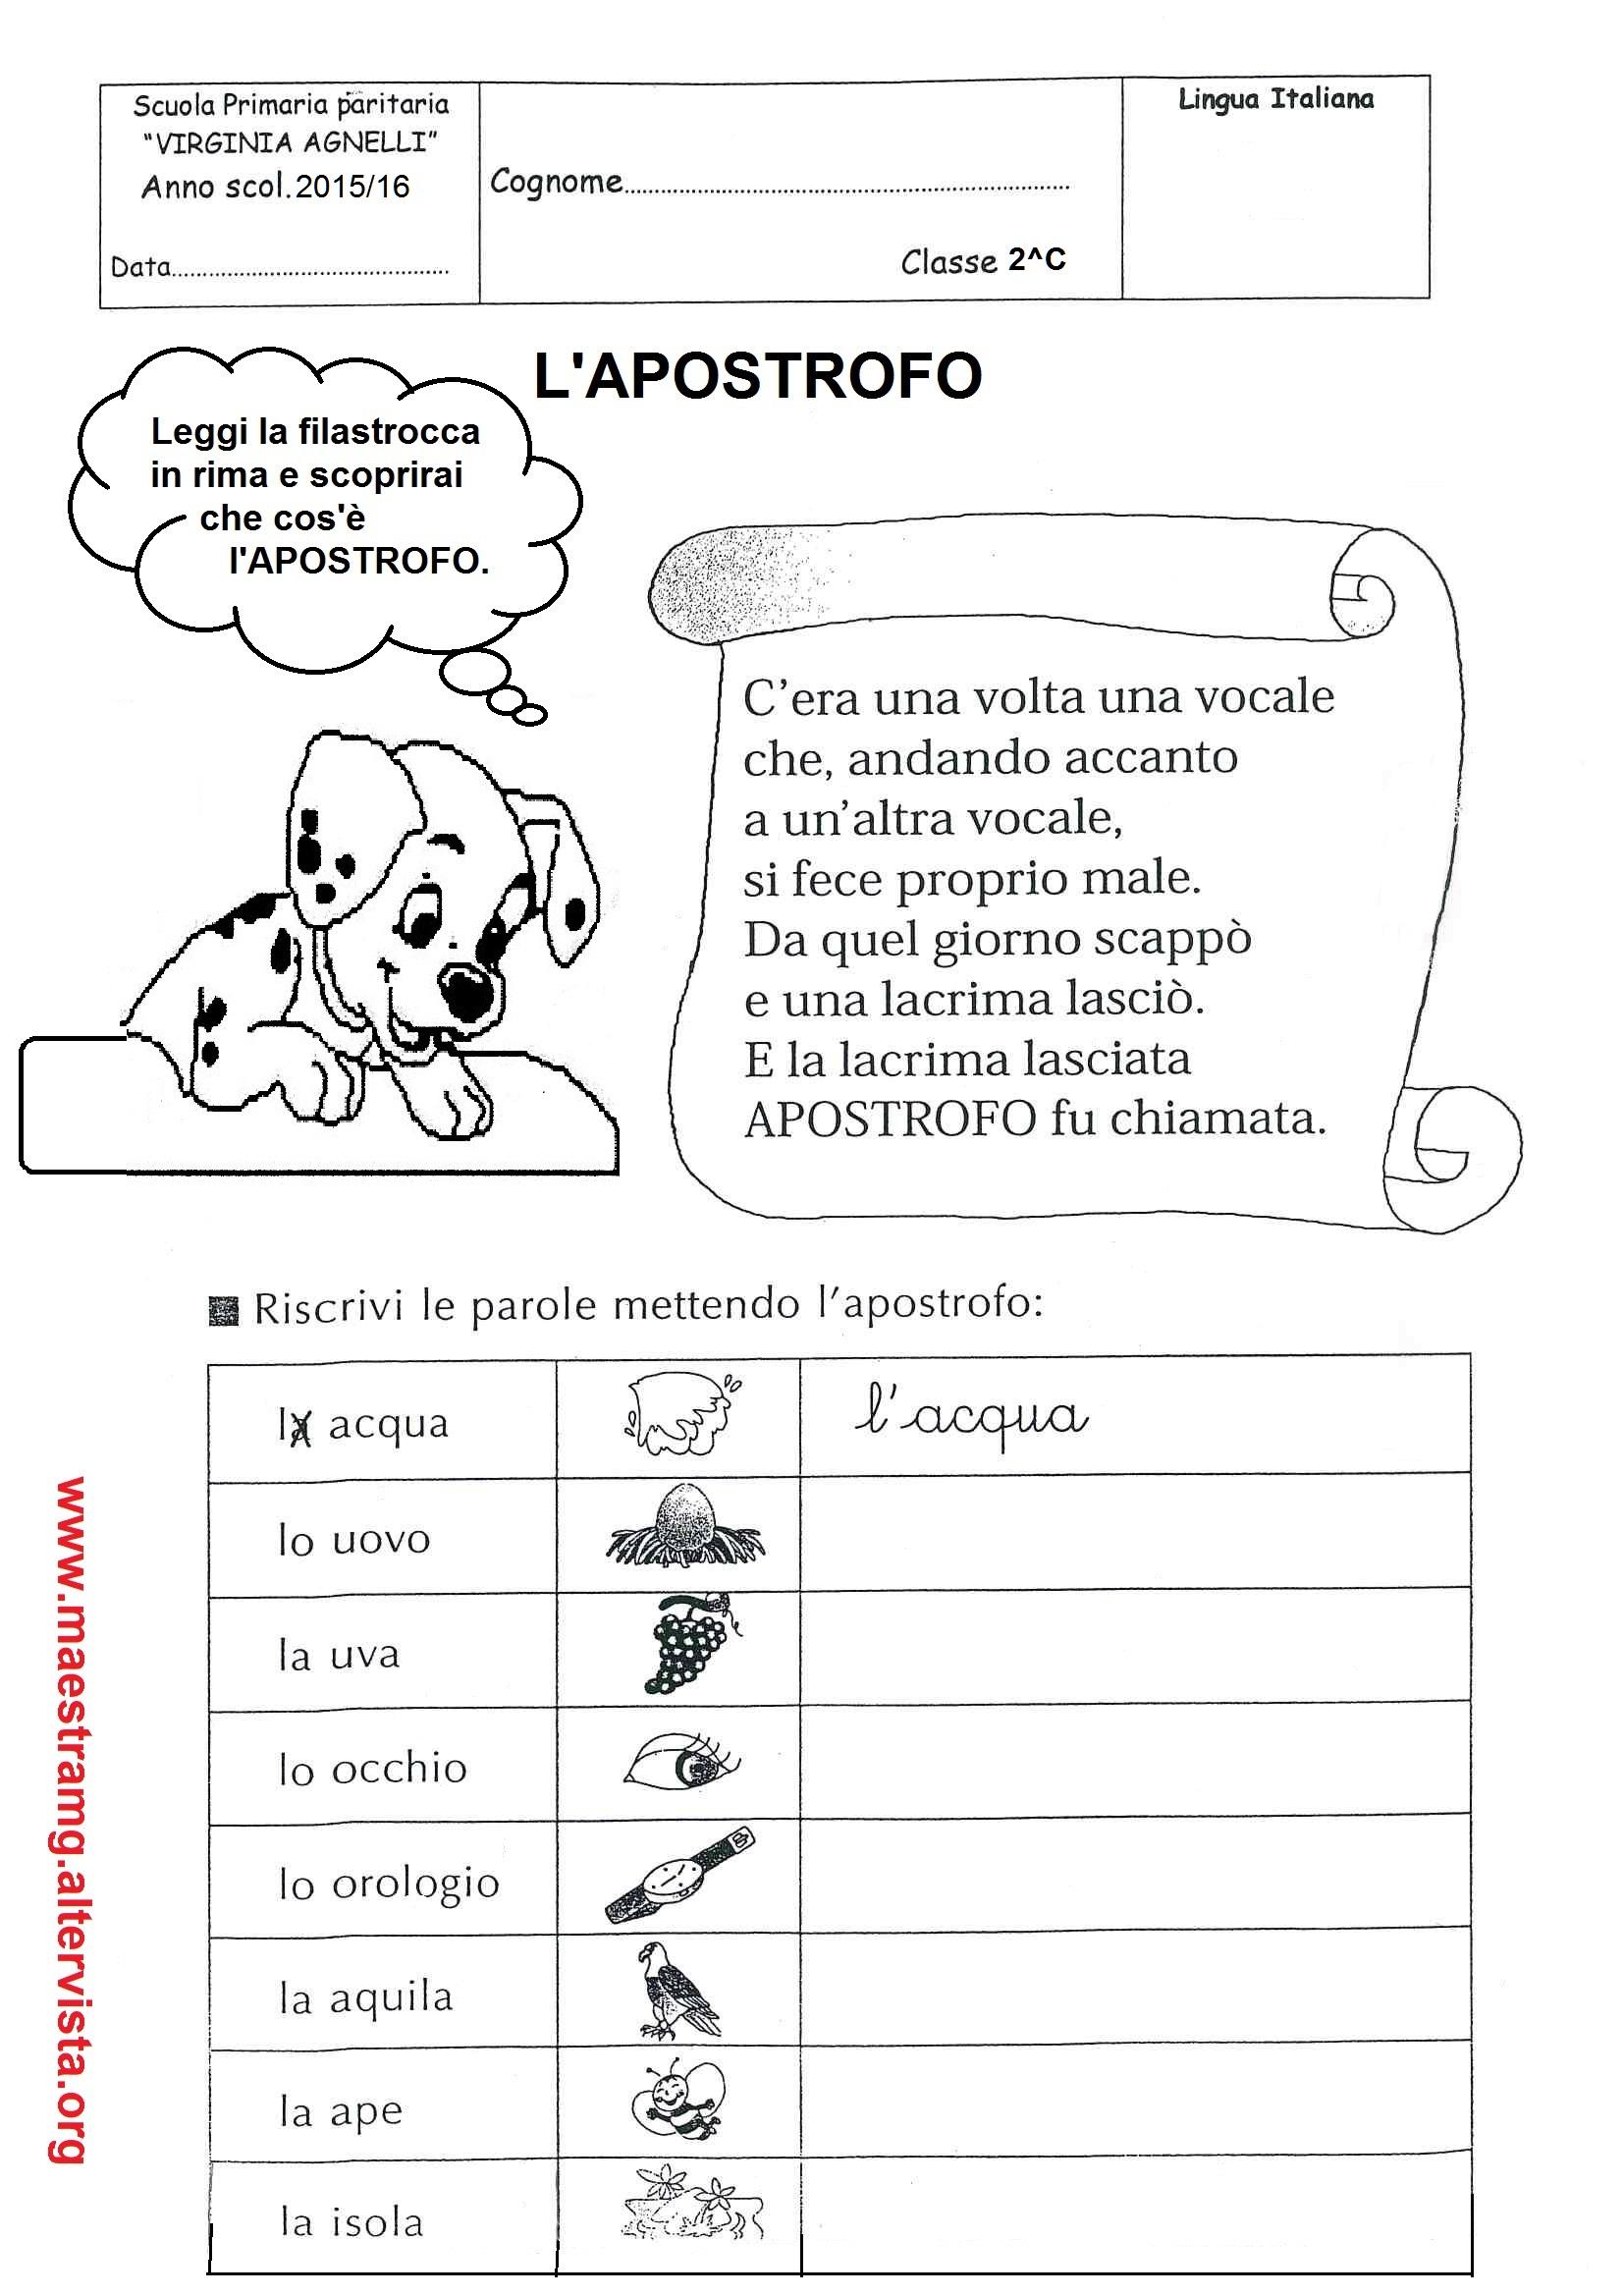 Favoloso Seconda classe - LINGUA ITALIANA | MAESTRA MG MAESTRA MG NQ17